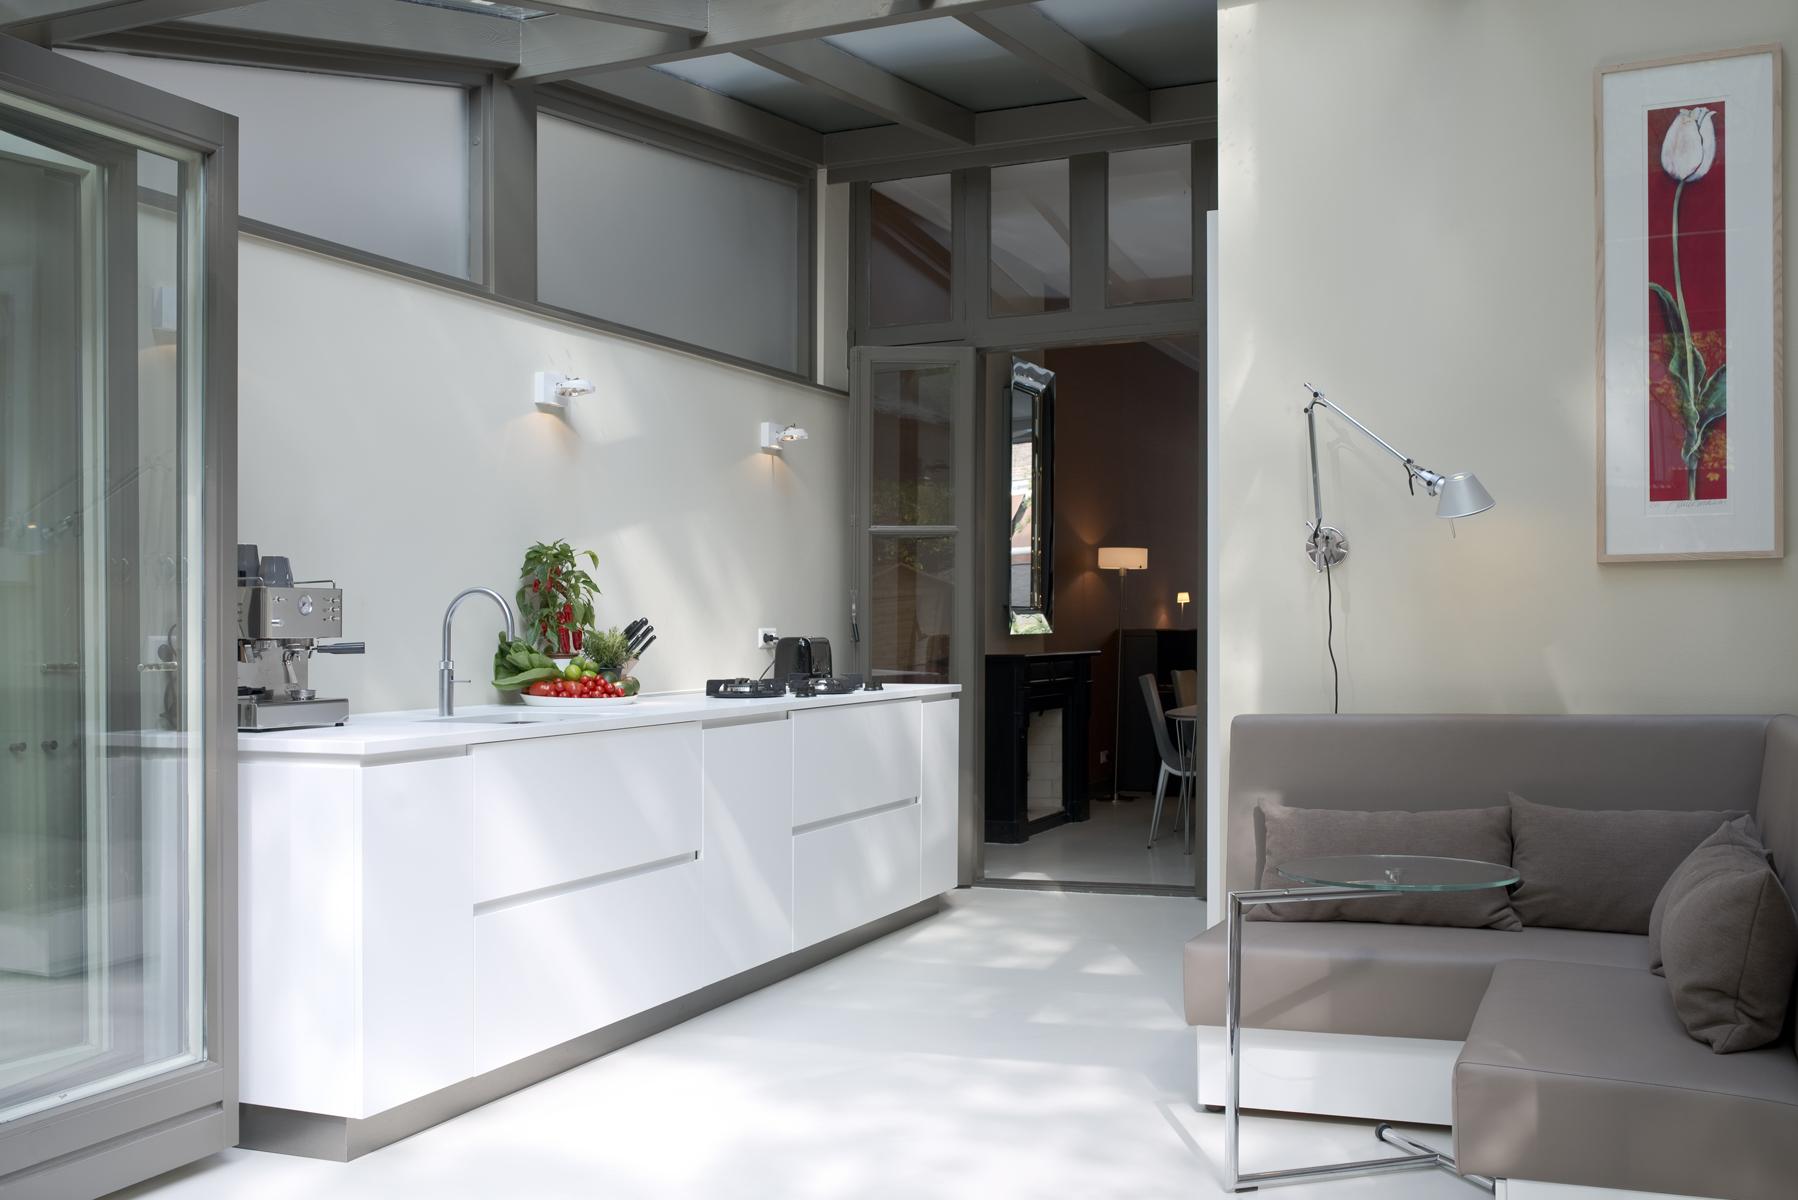 rietveld interieurbouw amsterdam keuken 1